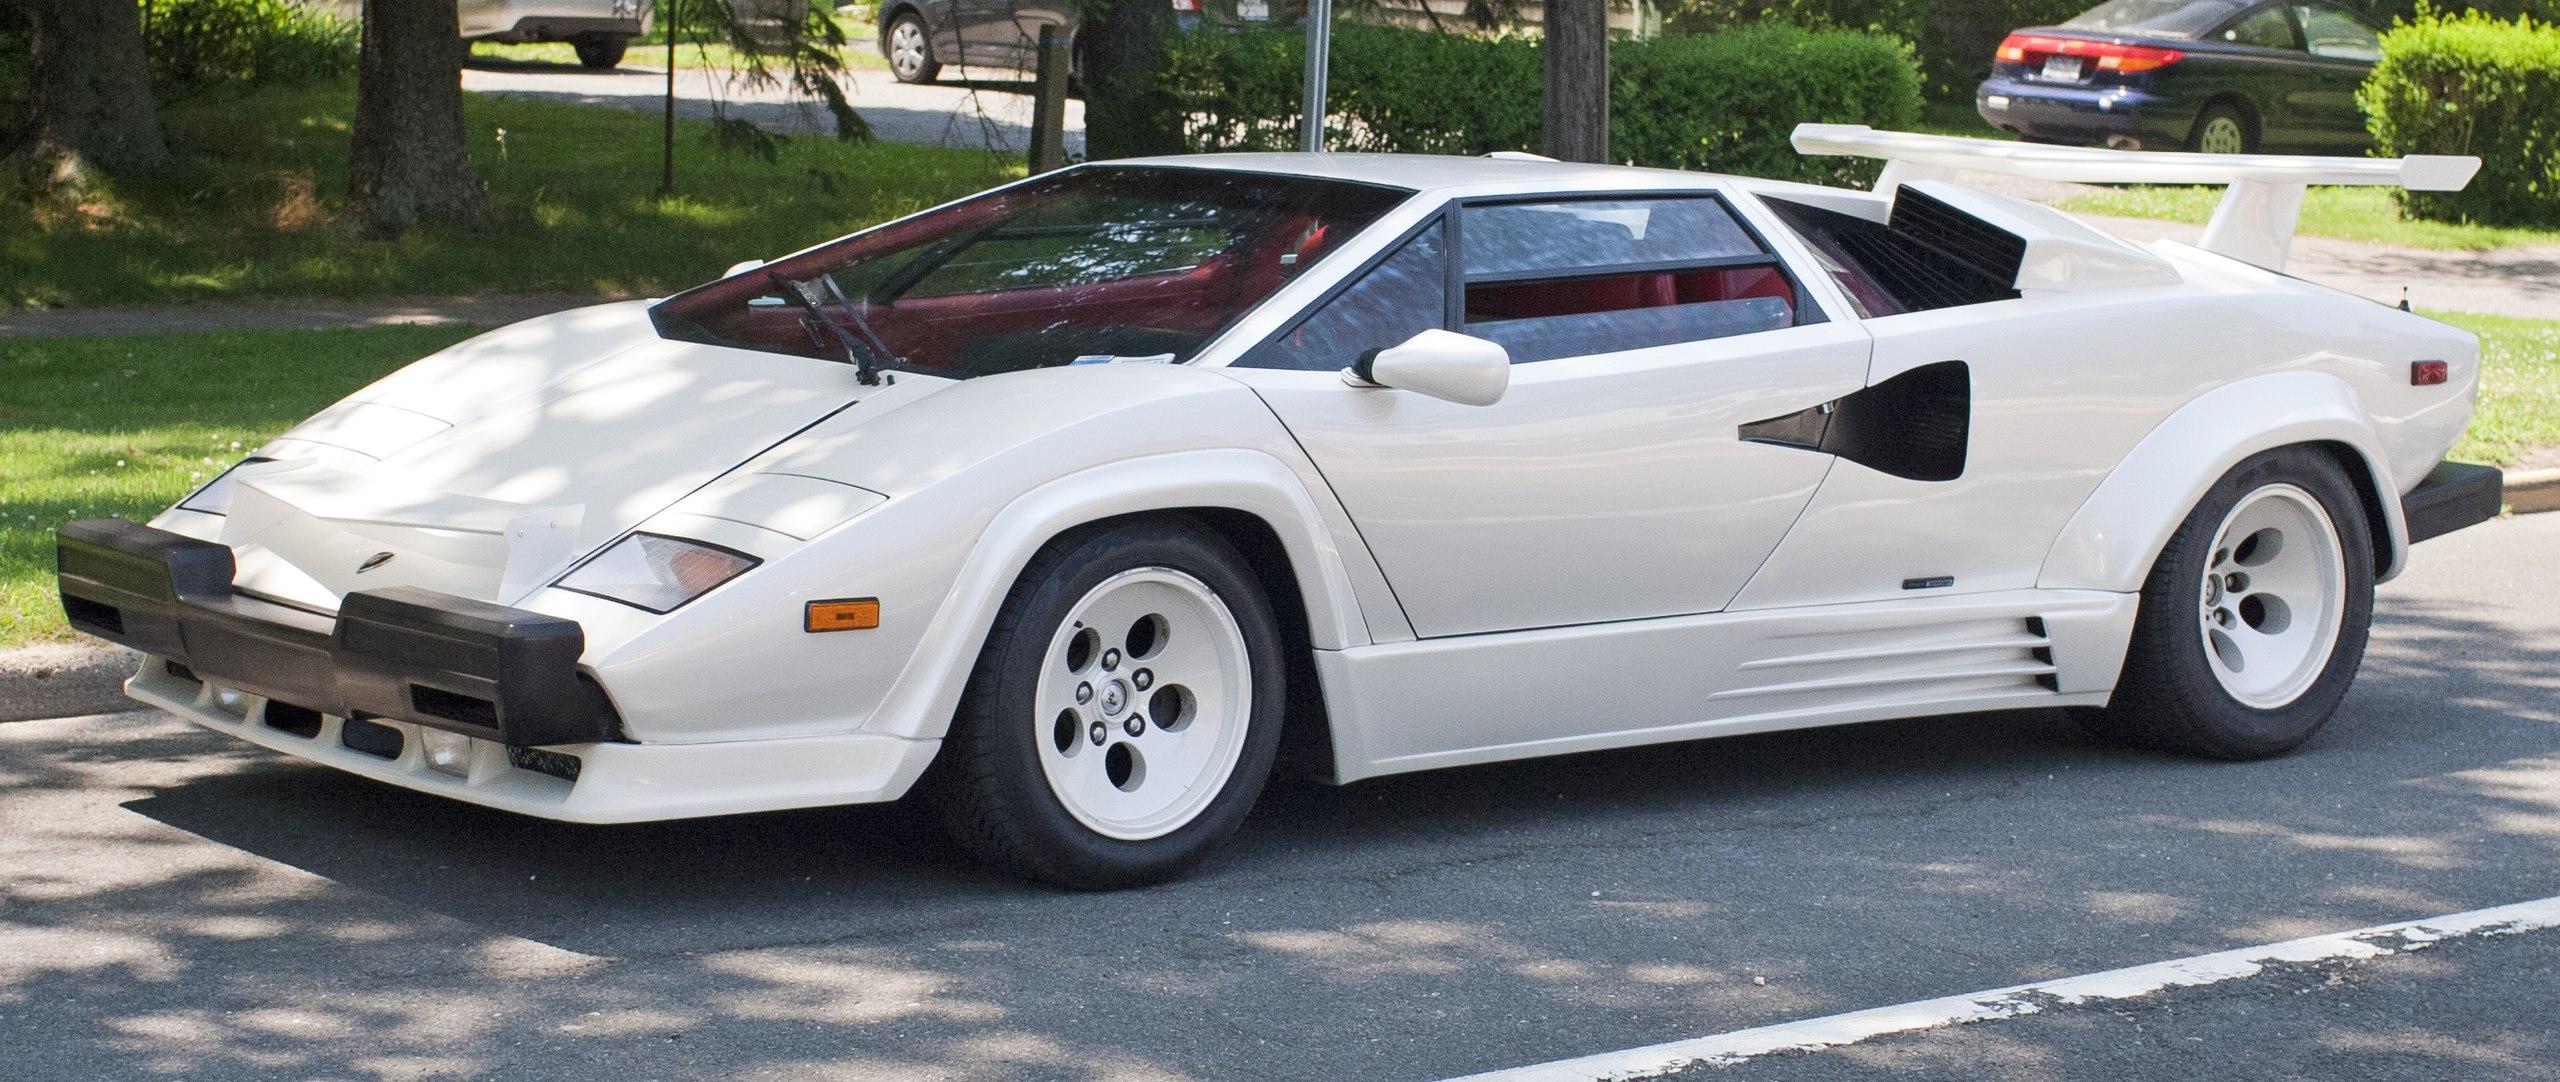 2560px-Lamborghini_Countach_US_spec_5000